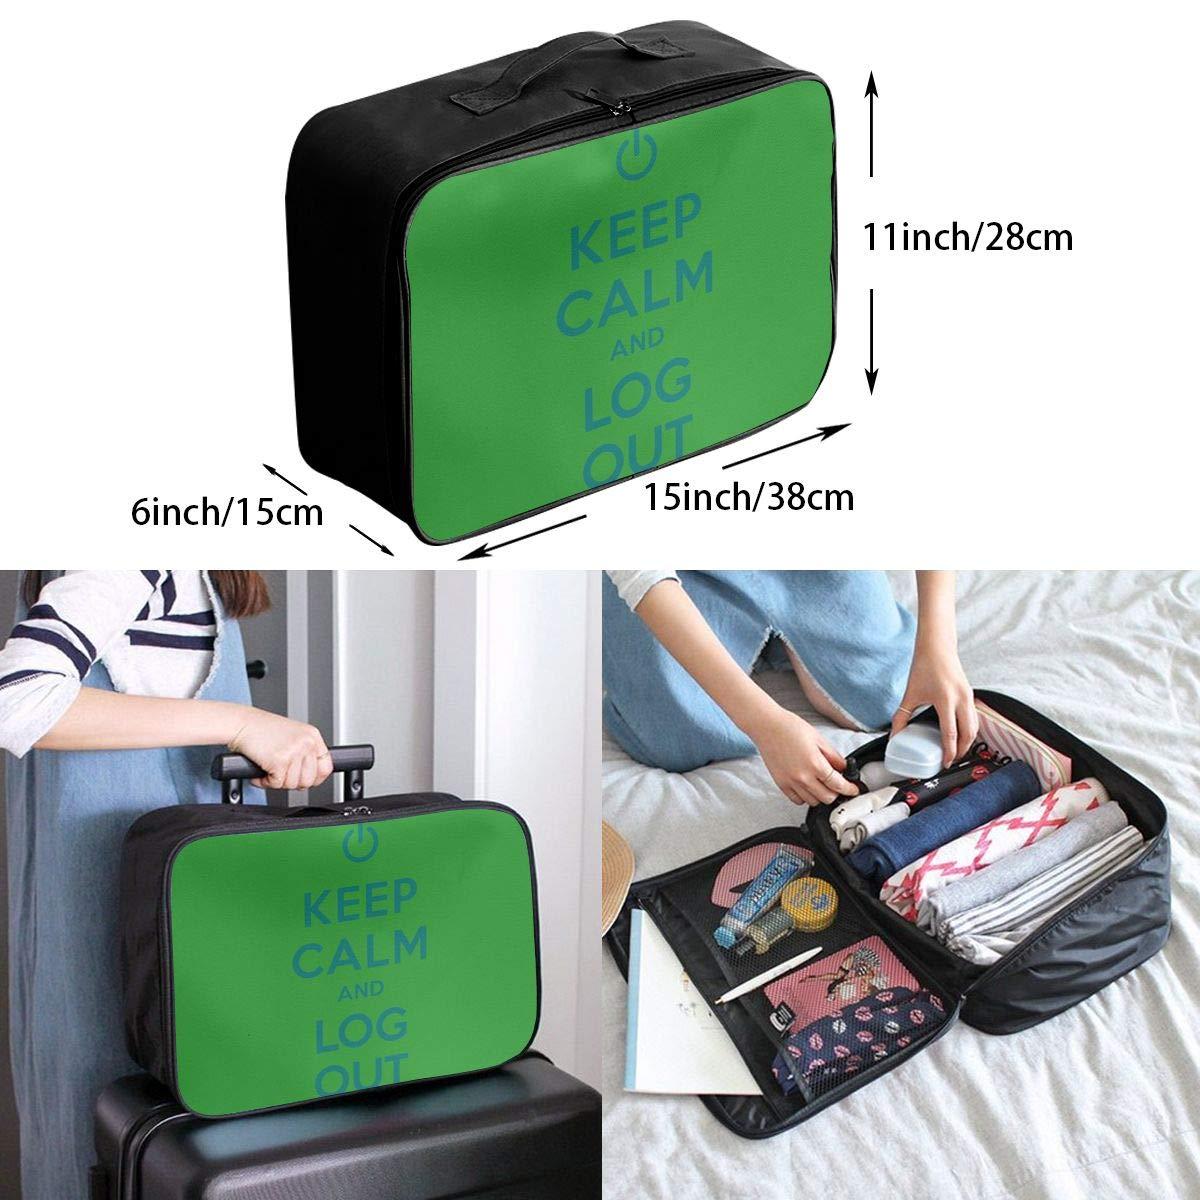 Travel Luggage Duffle Bag Lightweight Portable Handbag Log Out Large Capacity Waterproof Foldable Storage Tote